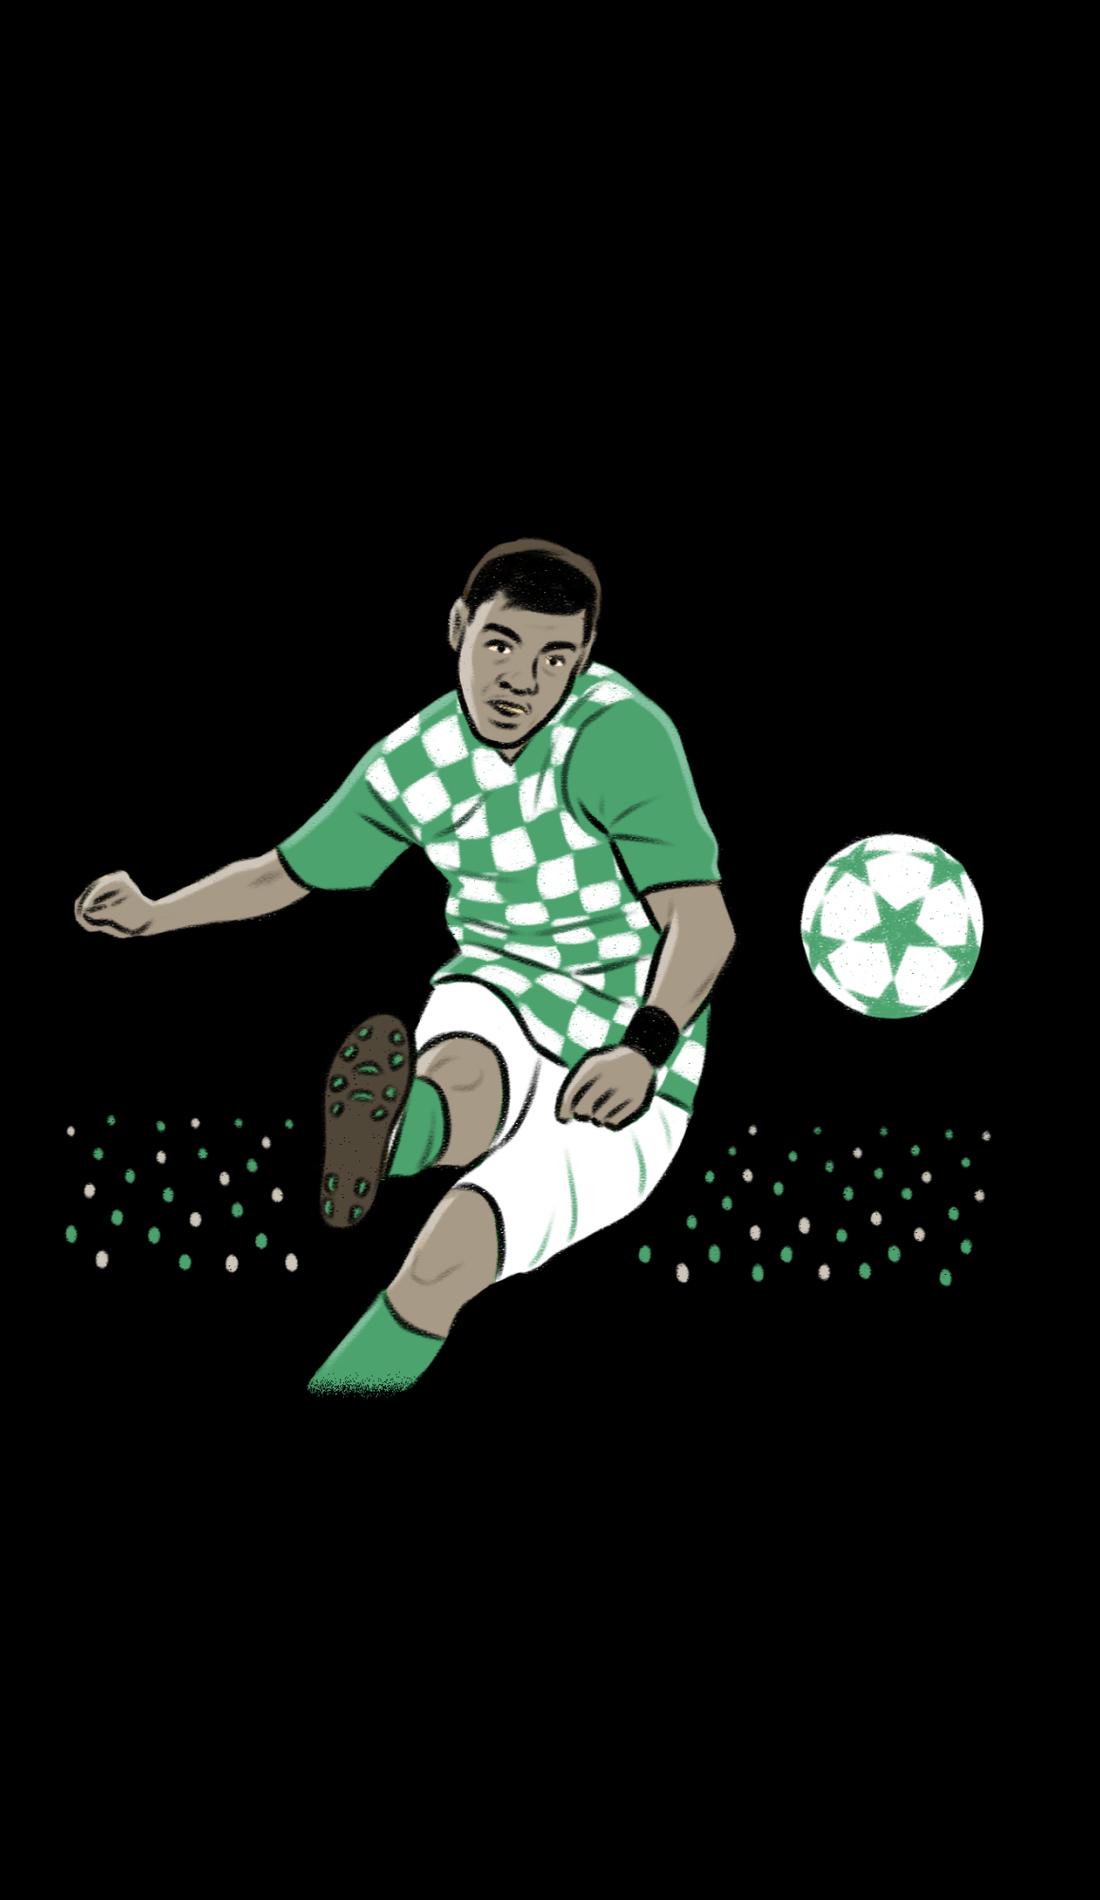 A Seattle University Redhawks Mens Soccer live event